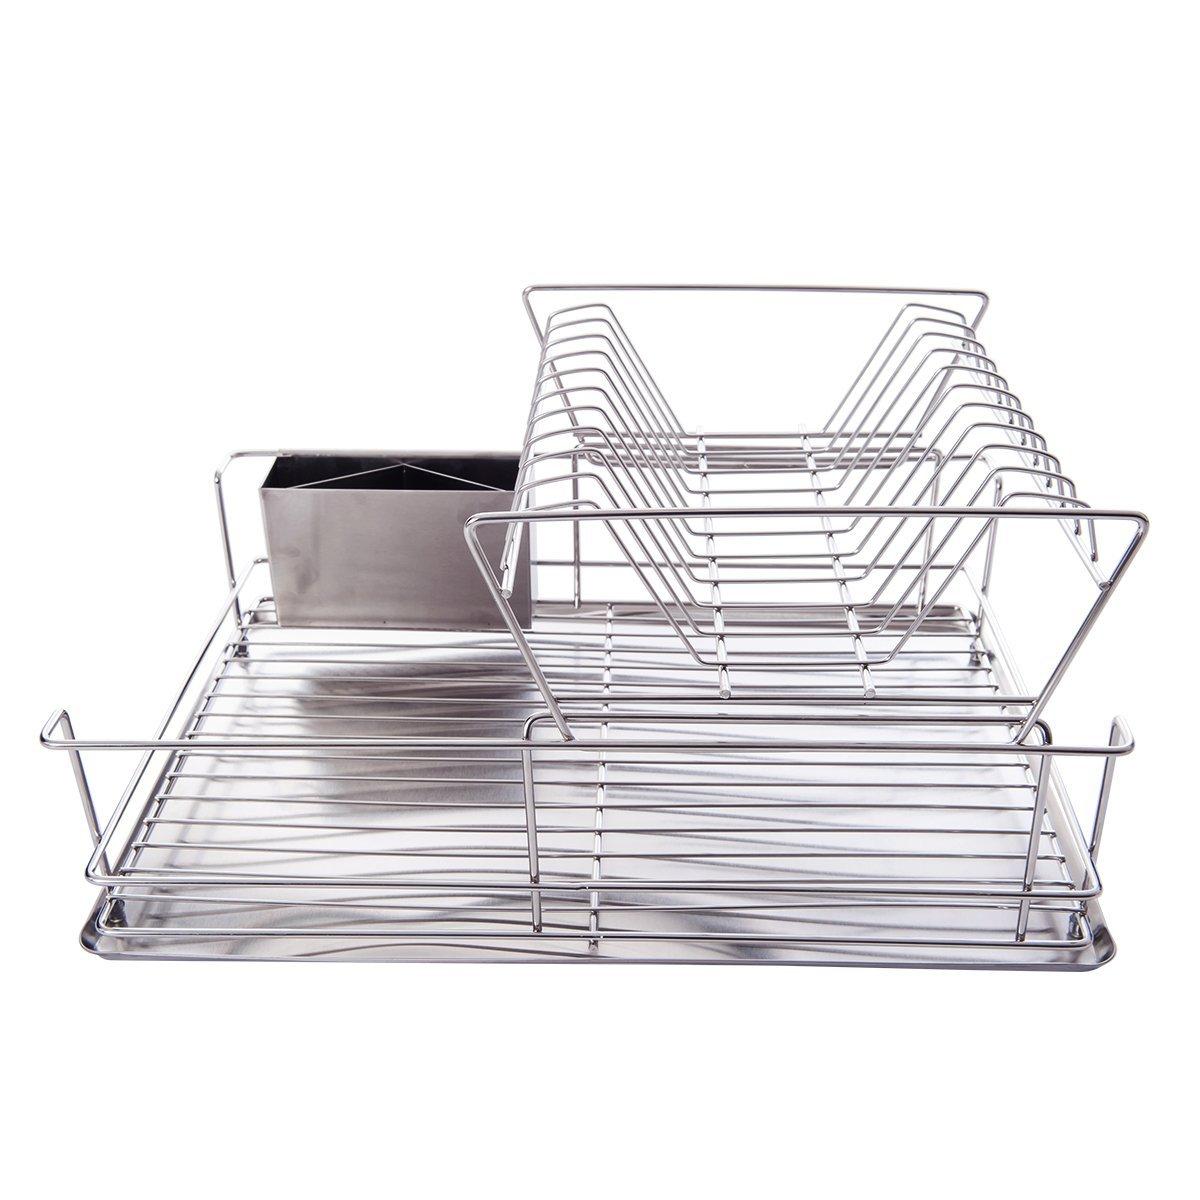 abtropfgestell abtropfst nder edelstahl abtropfgitter geschirr abtropfkorb ebay. Black Bedroom Furniture Sets. Home Design Ideas